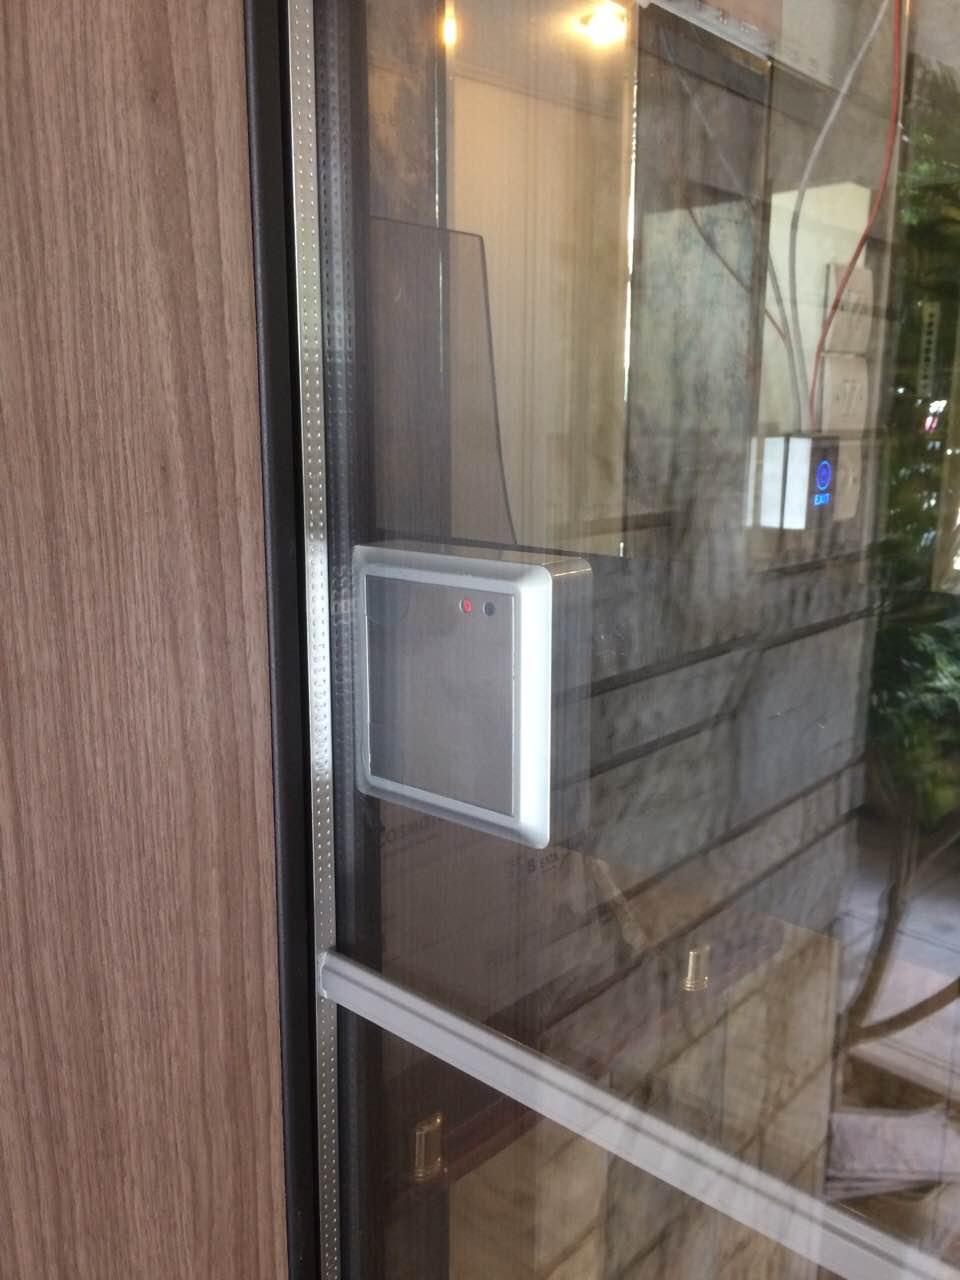 Access Control εξώπορτα πολυκατοικίας